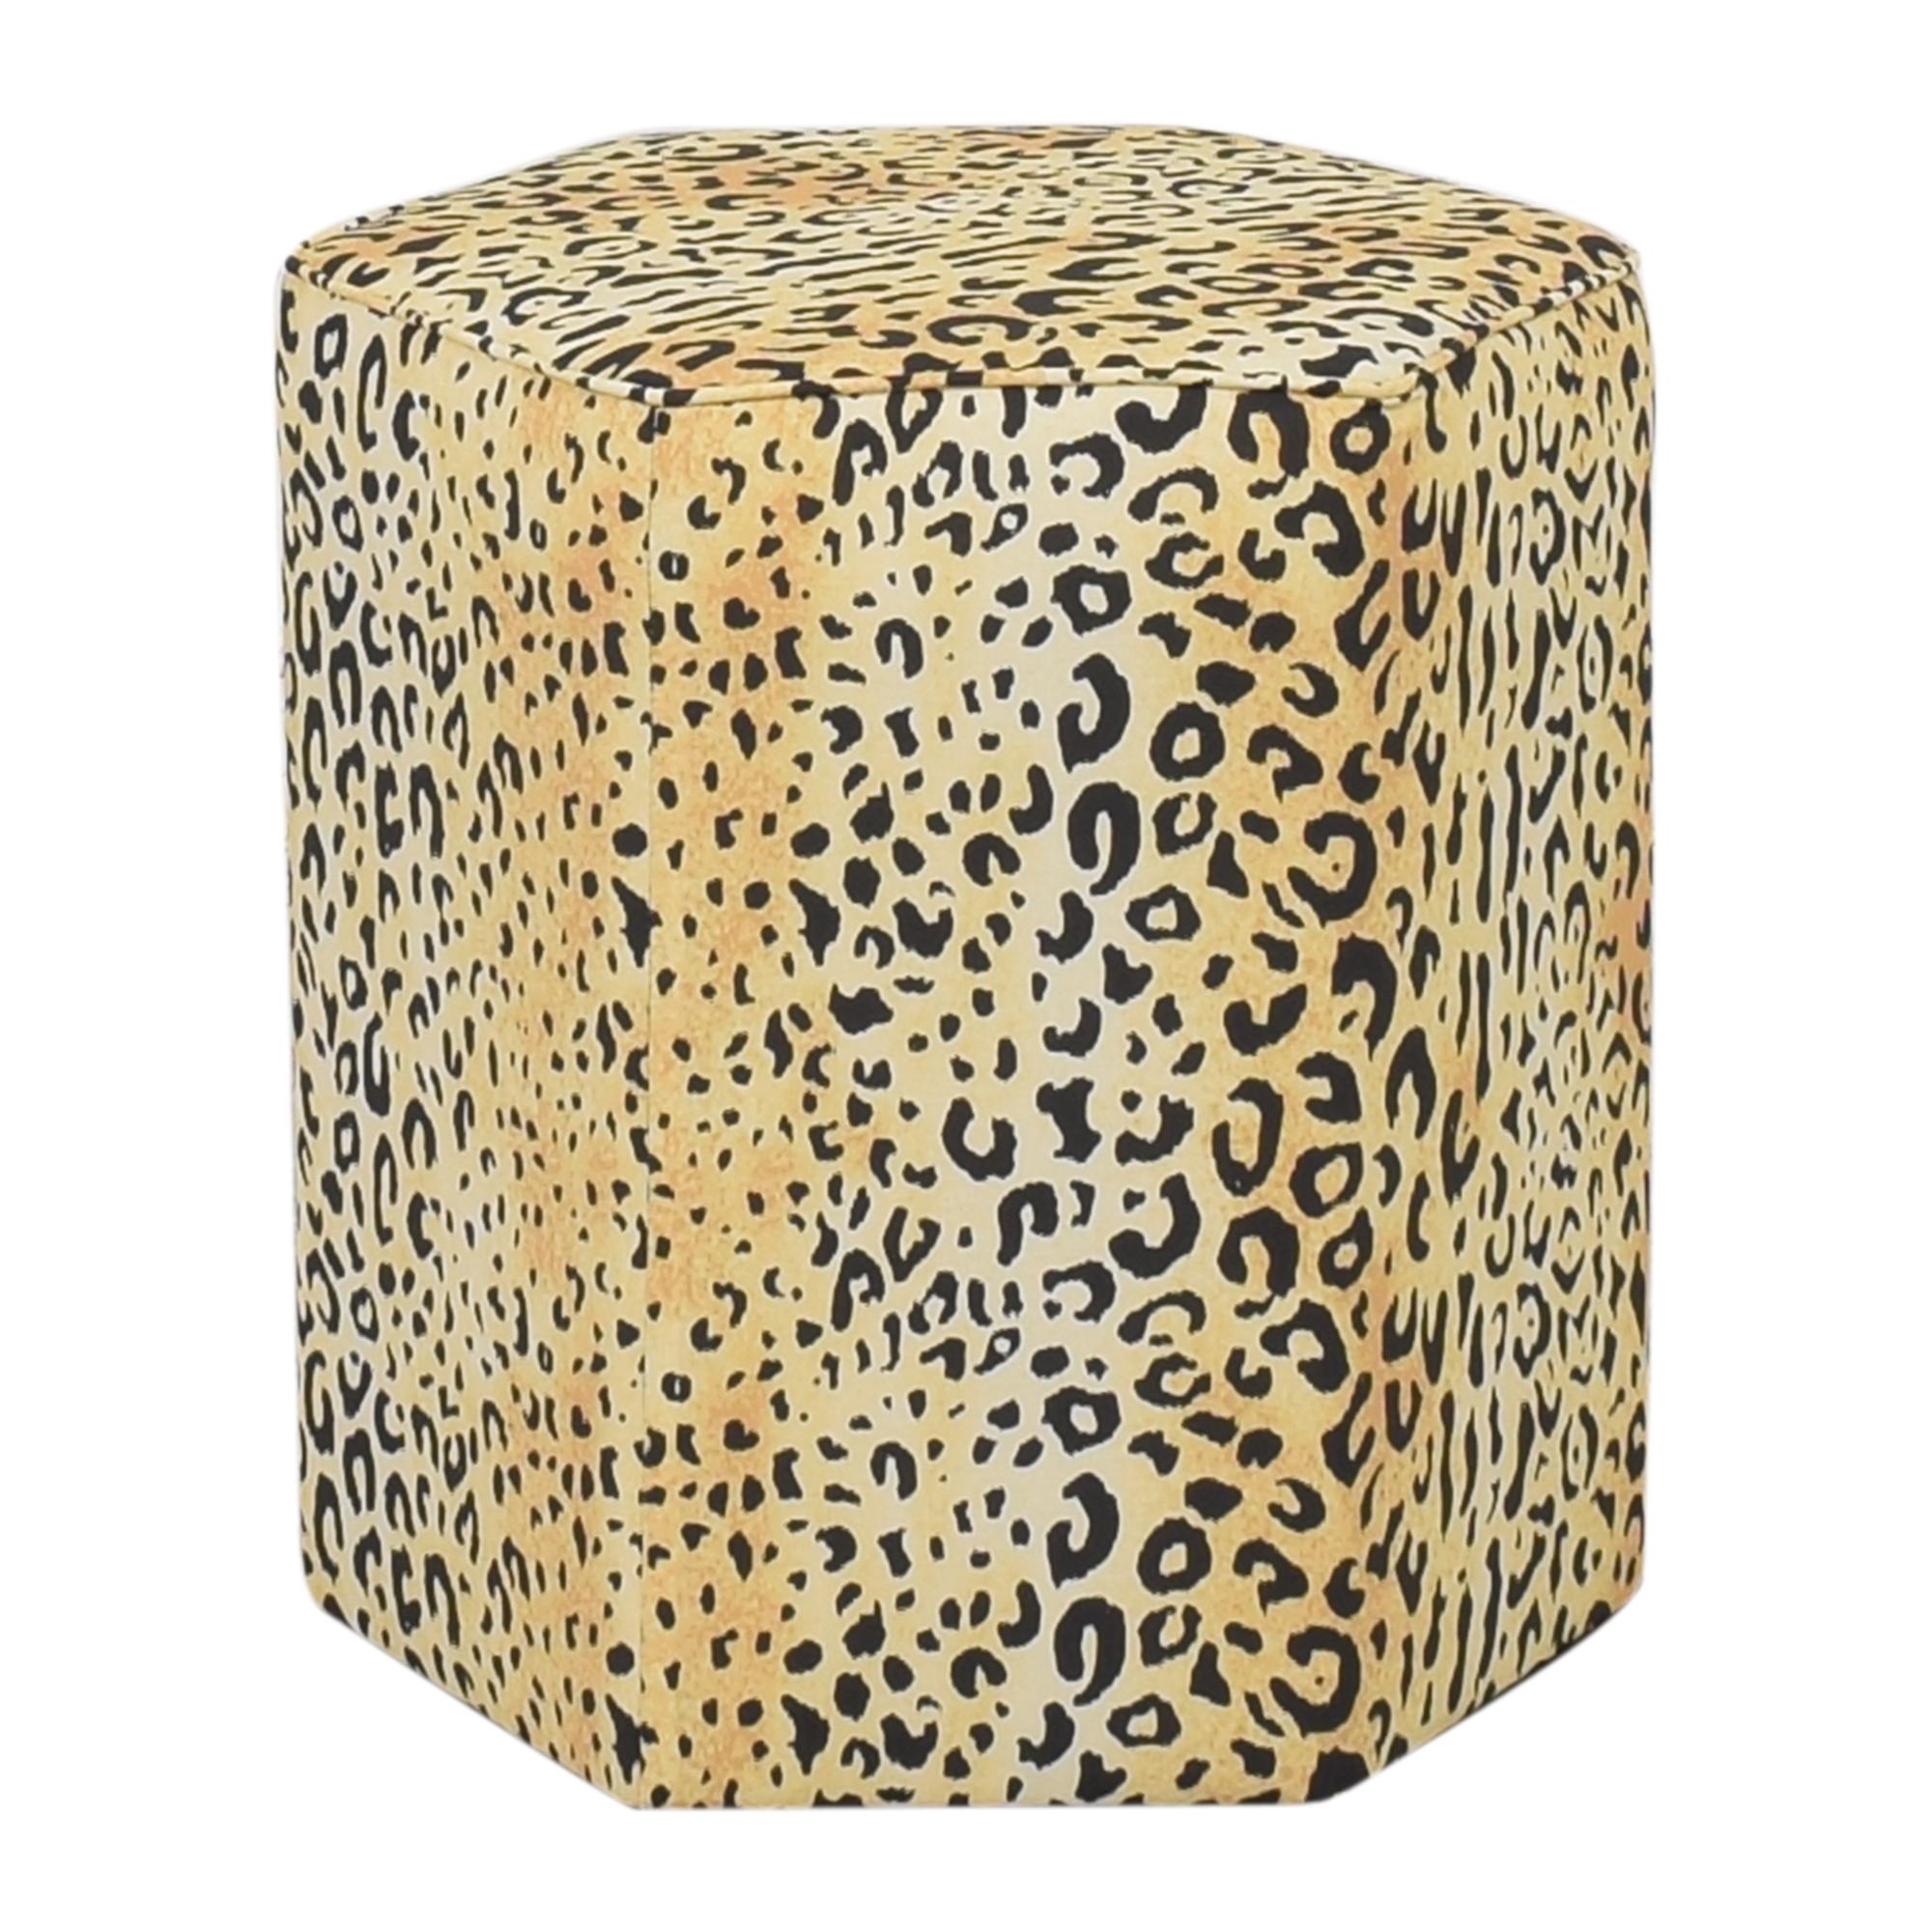 The Inside The Inside Leopard Hexagonal Ottoman used